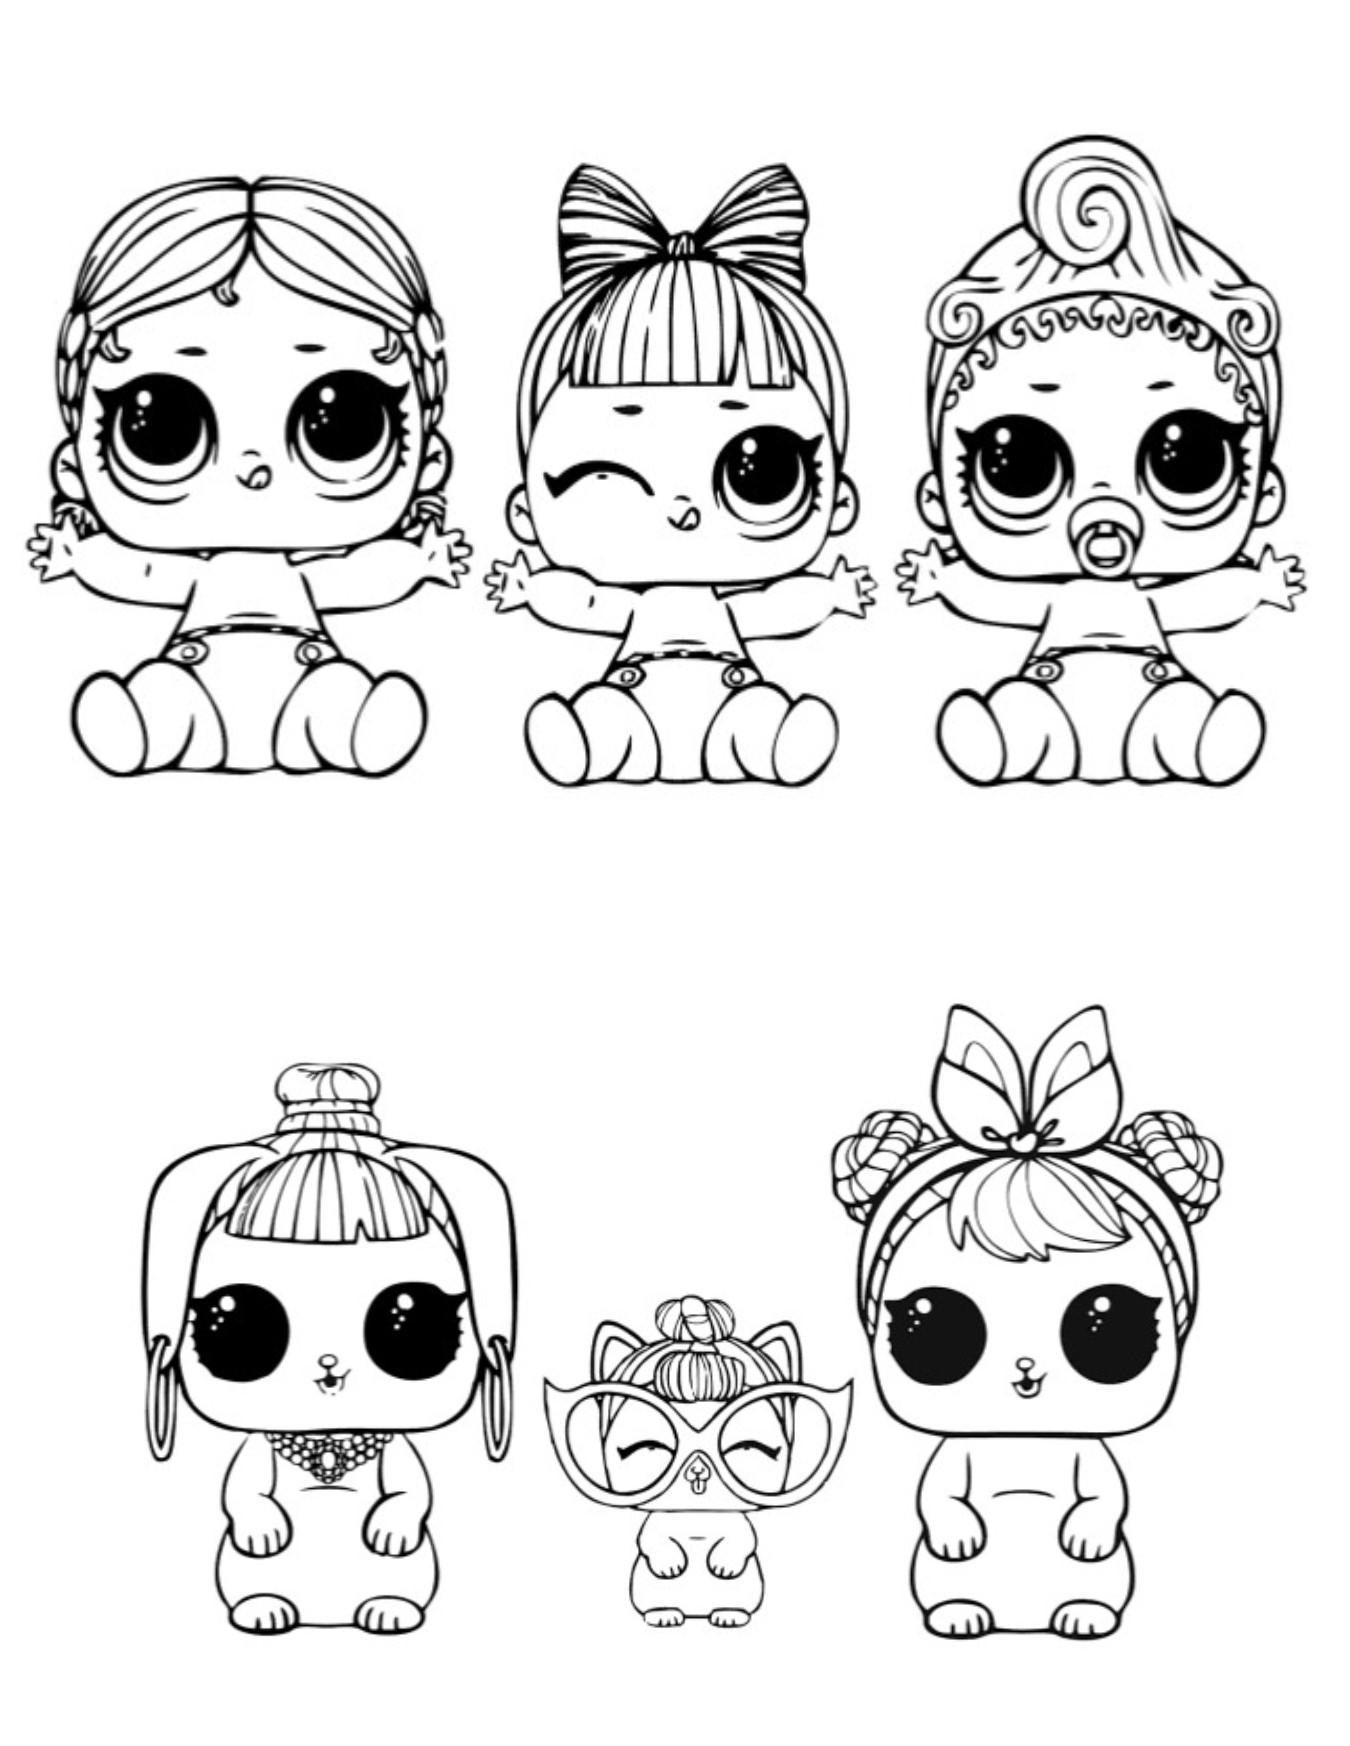 Куклы ЛОЛ три сестренки и питомцы - Куклы LOL - Раскраски ...